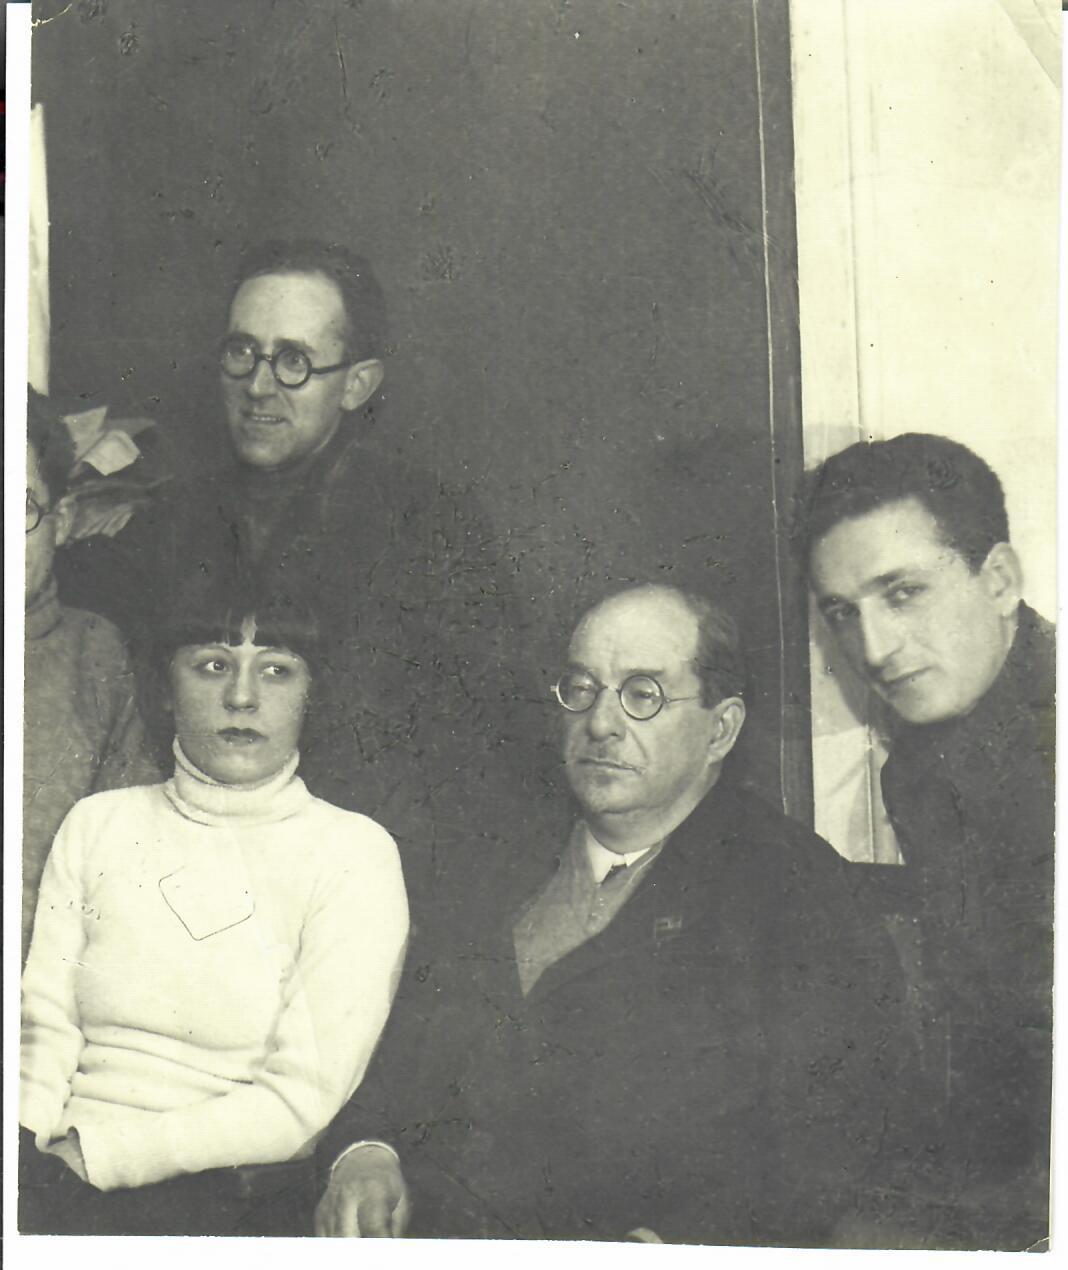 1930-е. Анатолий Васильевич  Луначарский в компании